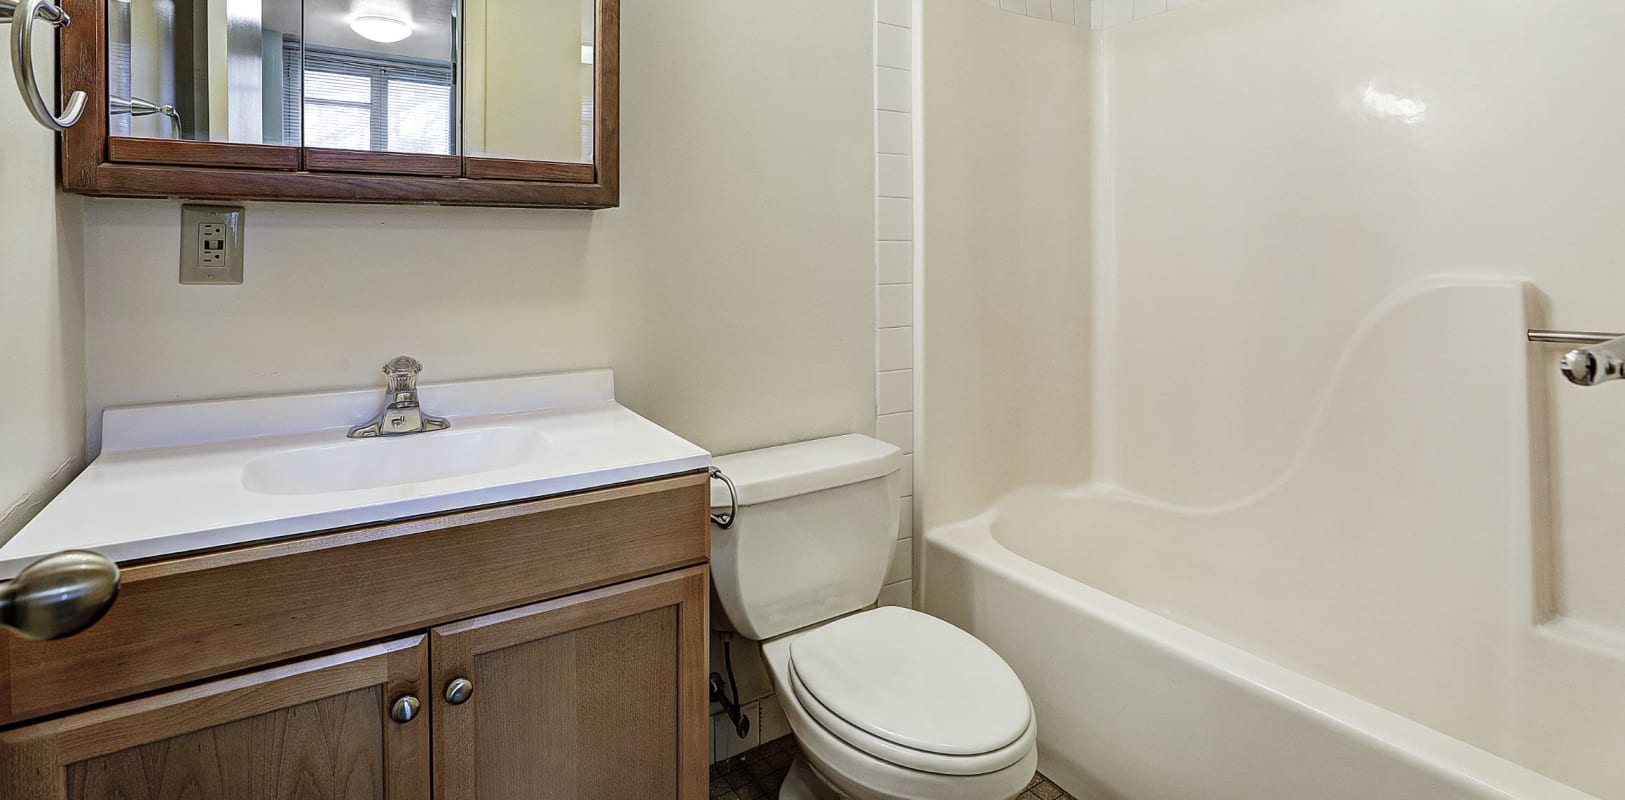 Clean bathroom at Brighton Court in Bethlehem, Pennsylvania